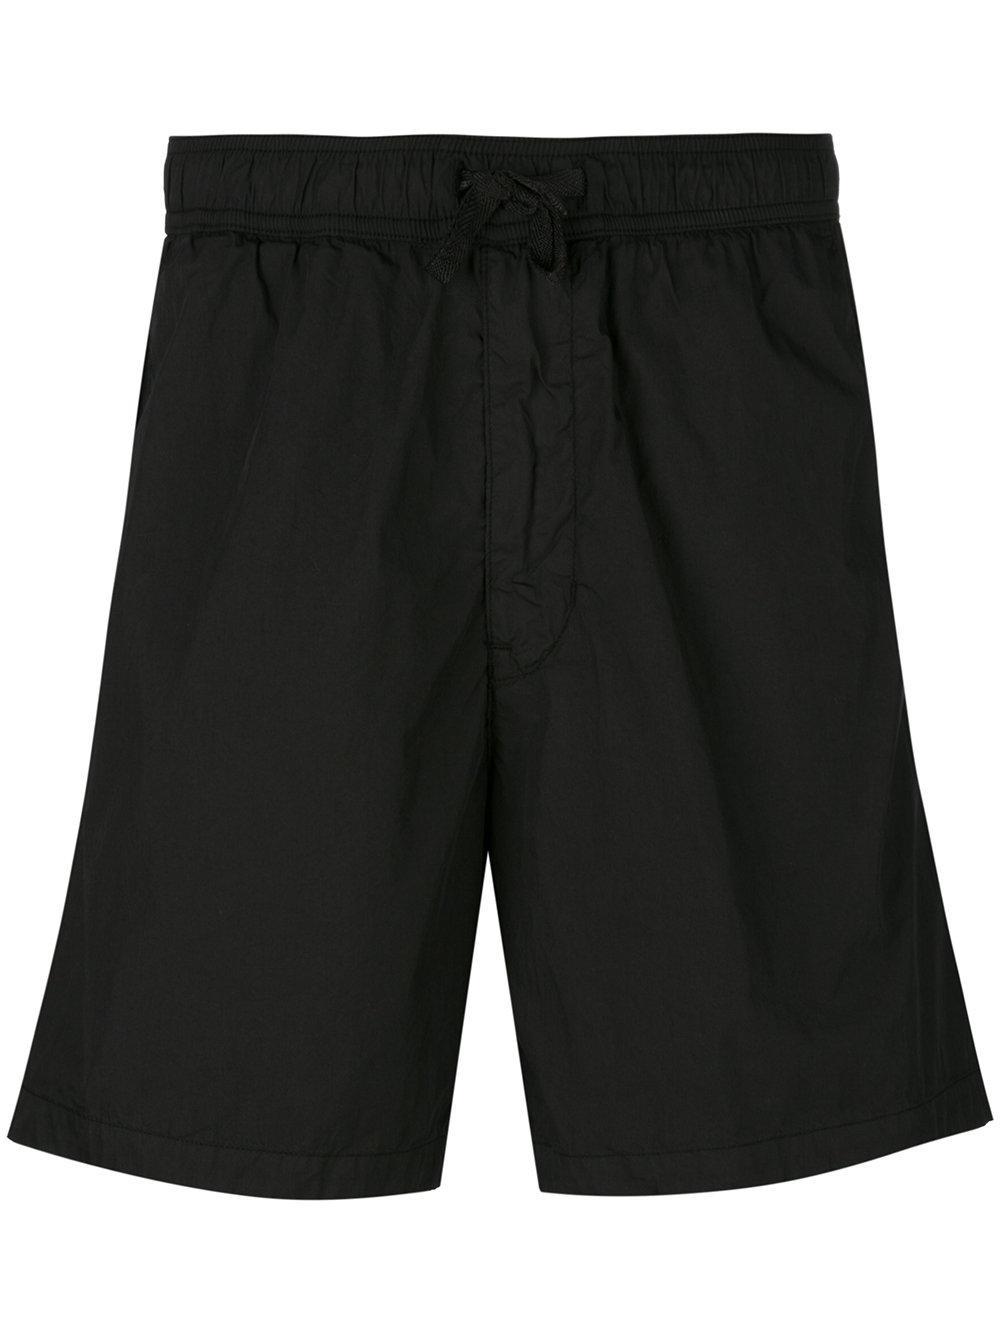 stone island track shorts in black for men lyst. Black Bedroom Furniture Sets. Home Design Ideas